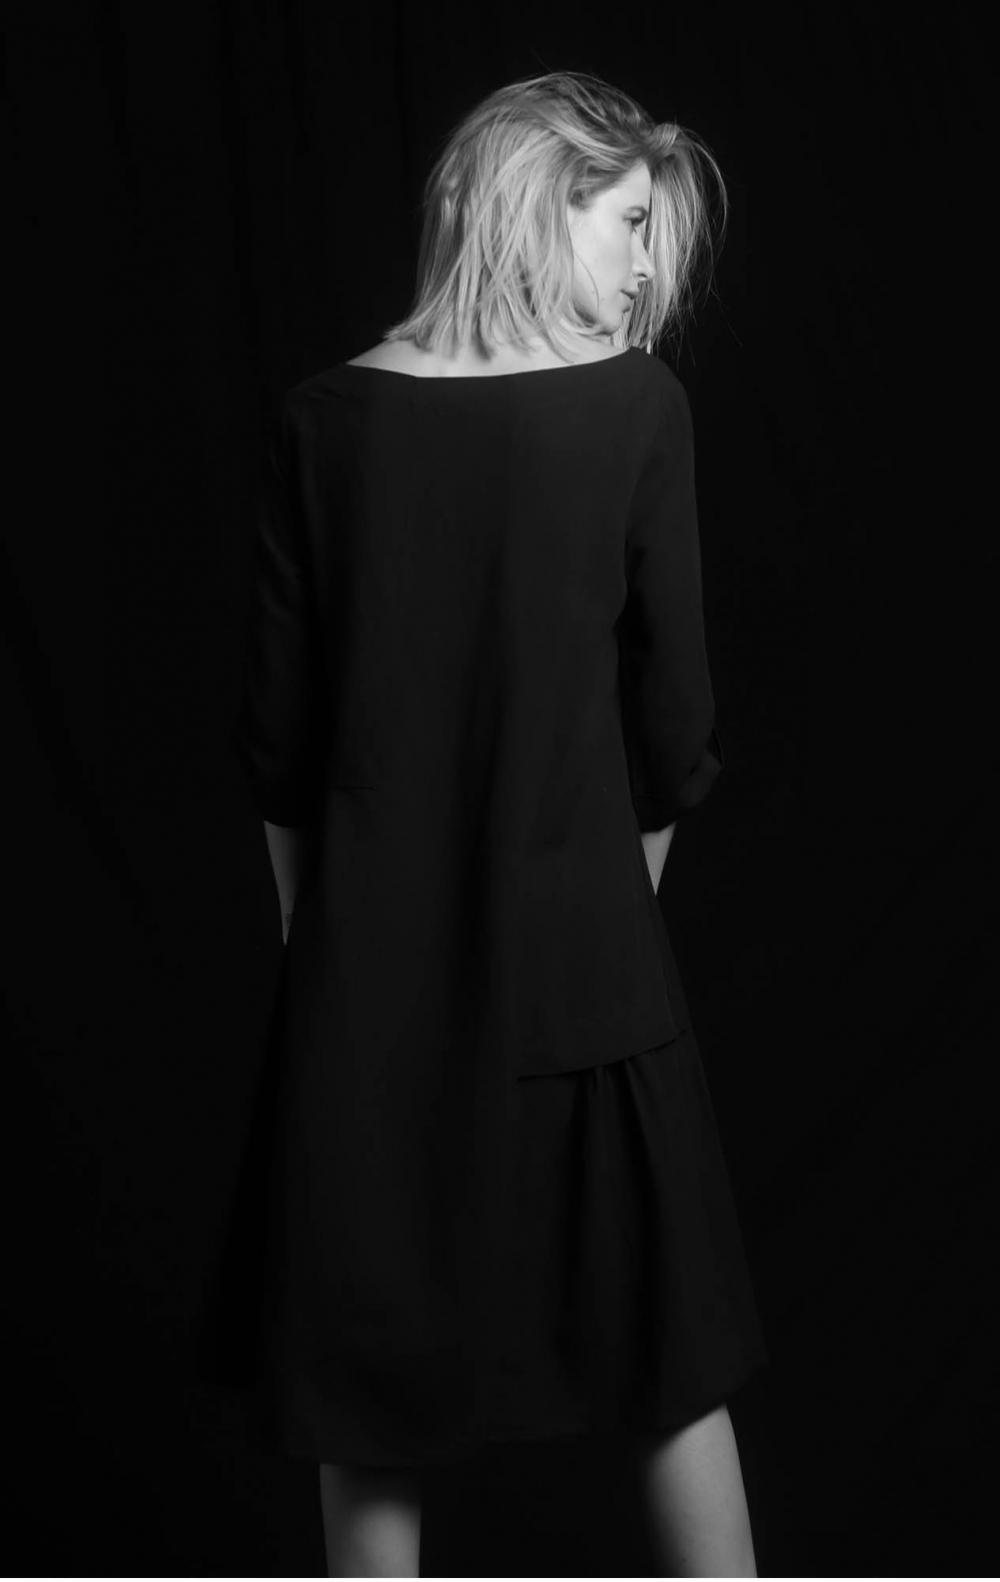 Vestido Linho Recortes Preto - Foto 2